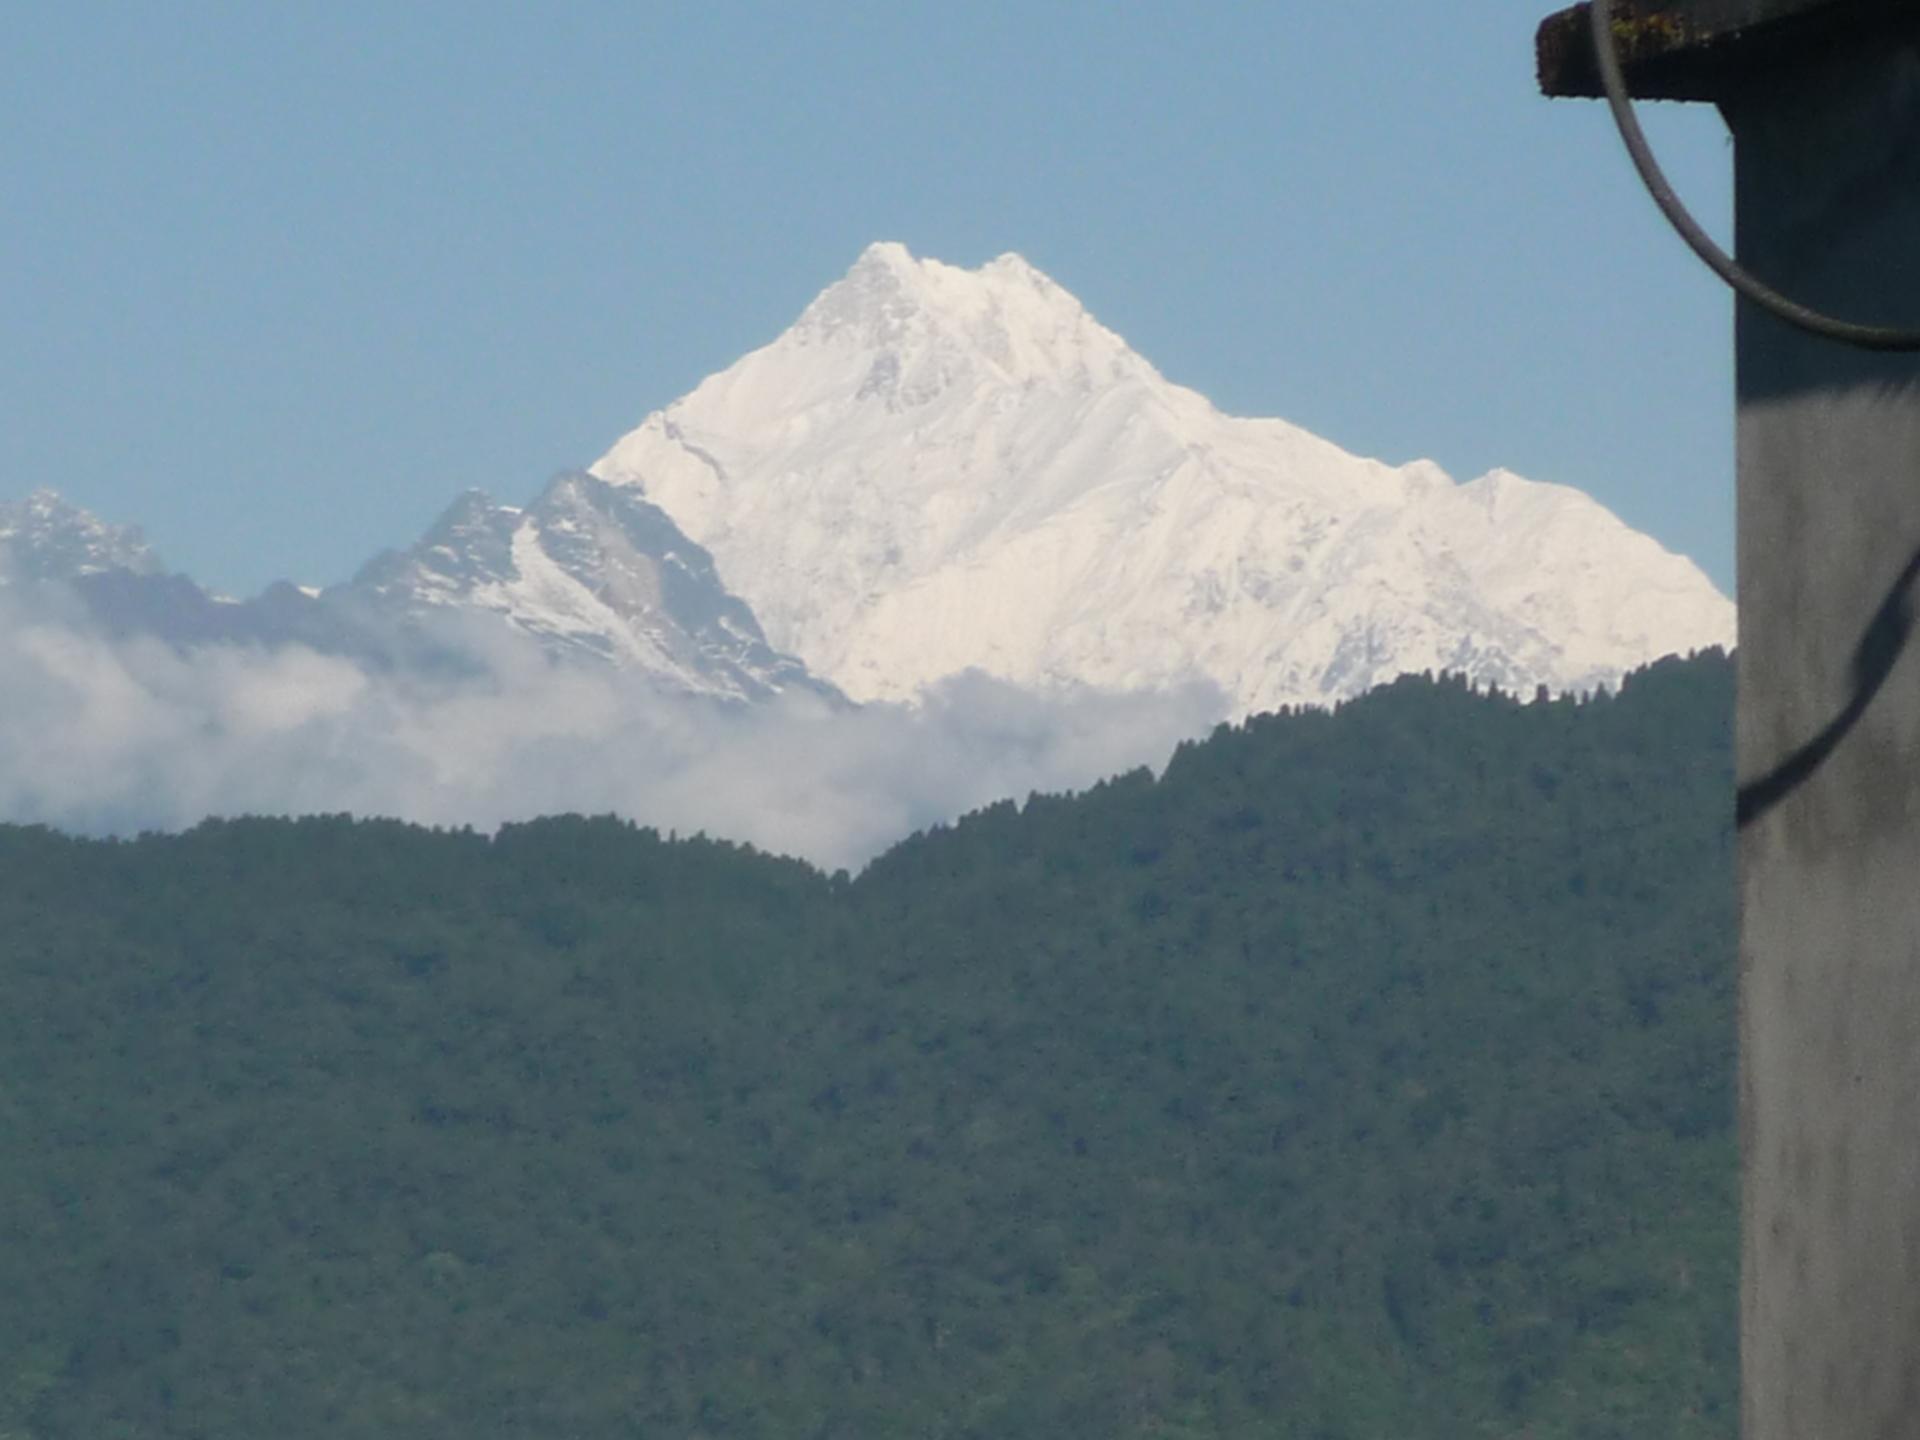 2017: Kanchenjunga from the hotel, Gangtok